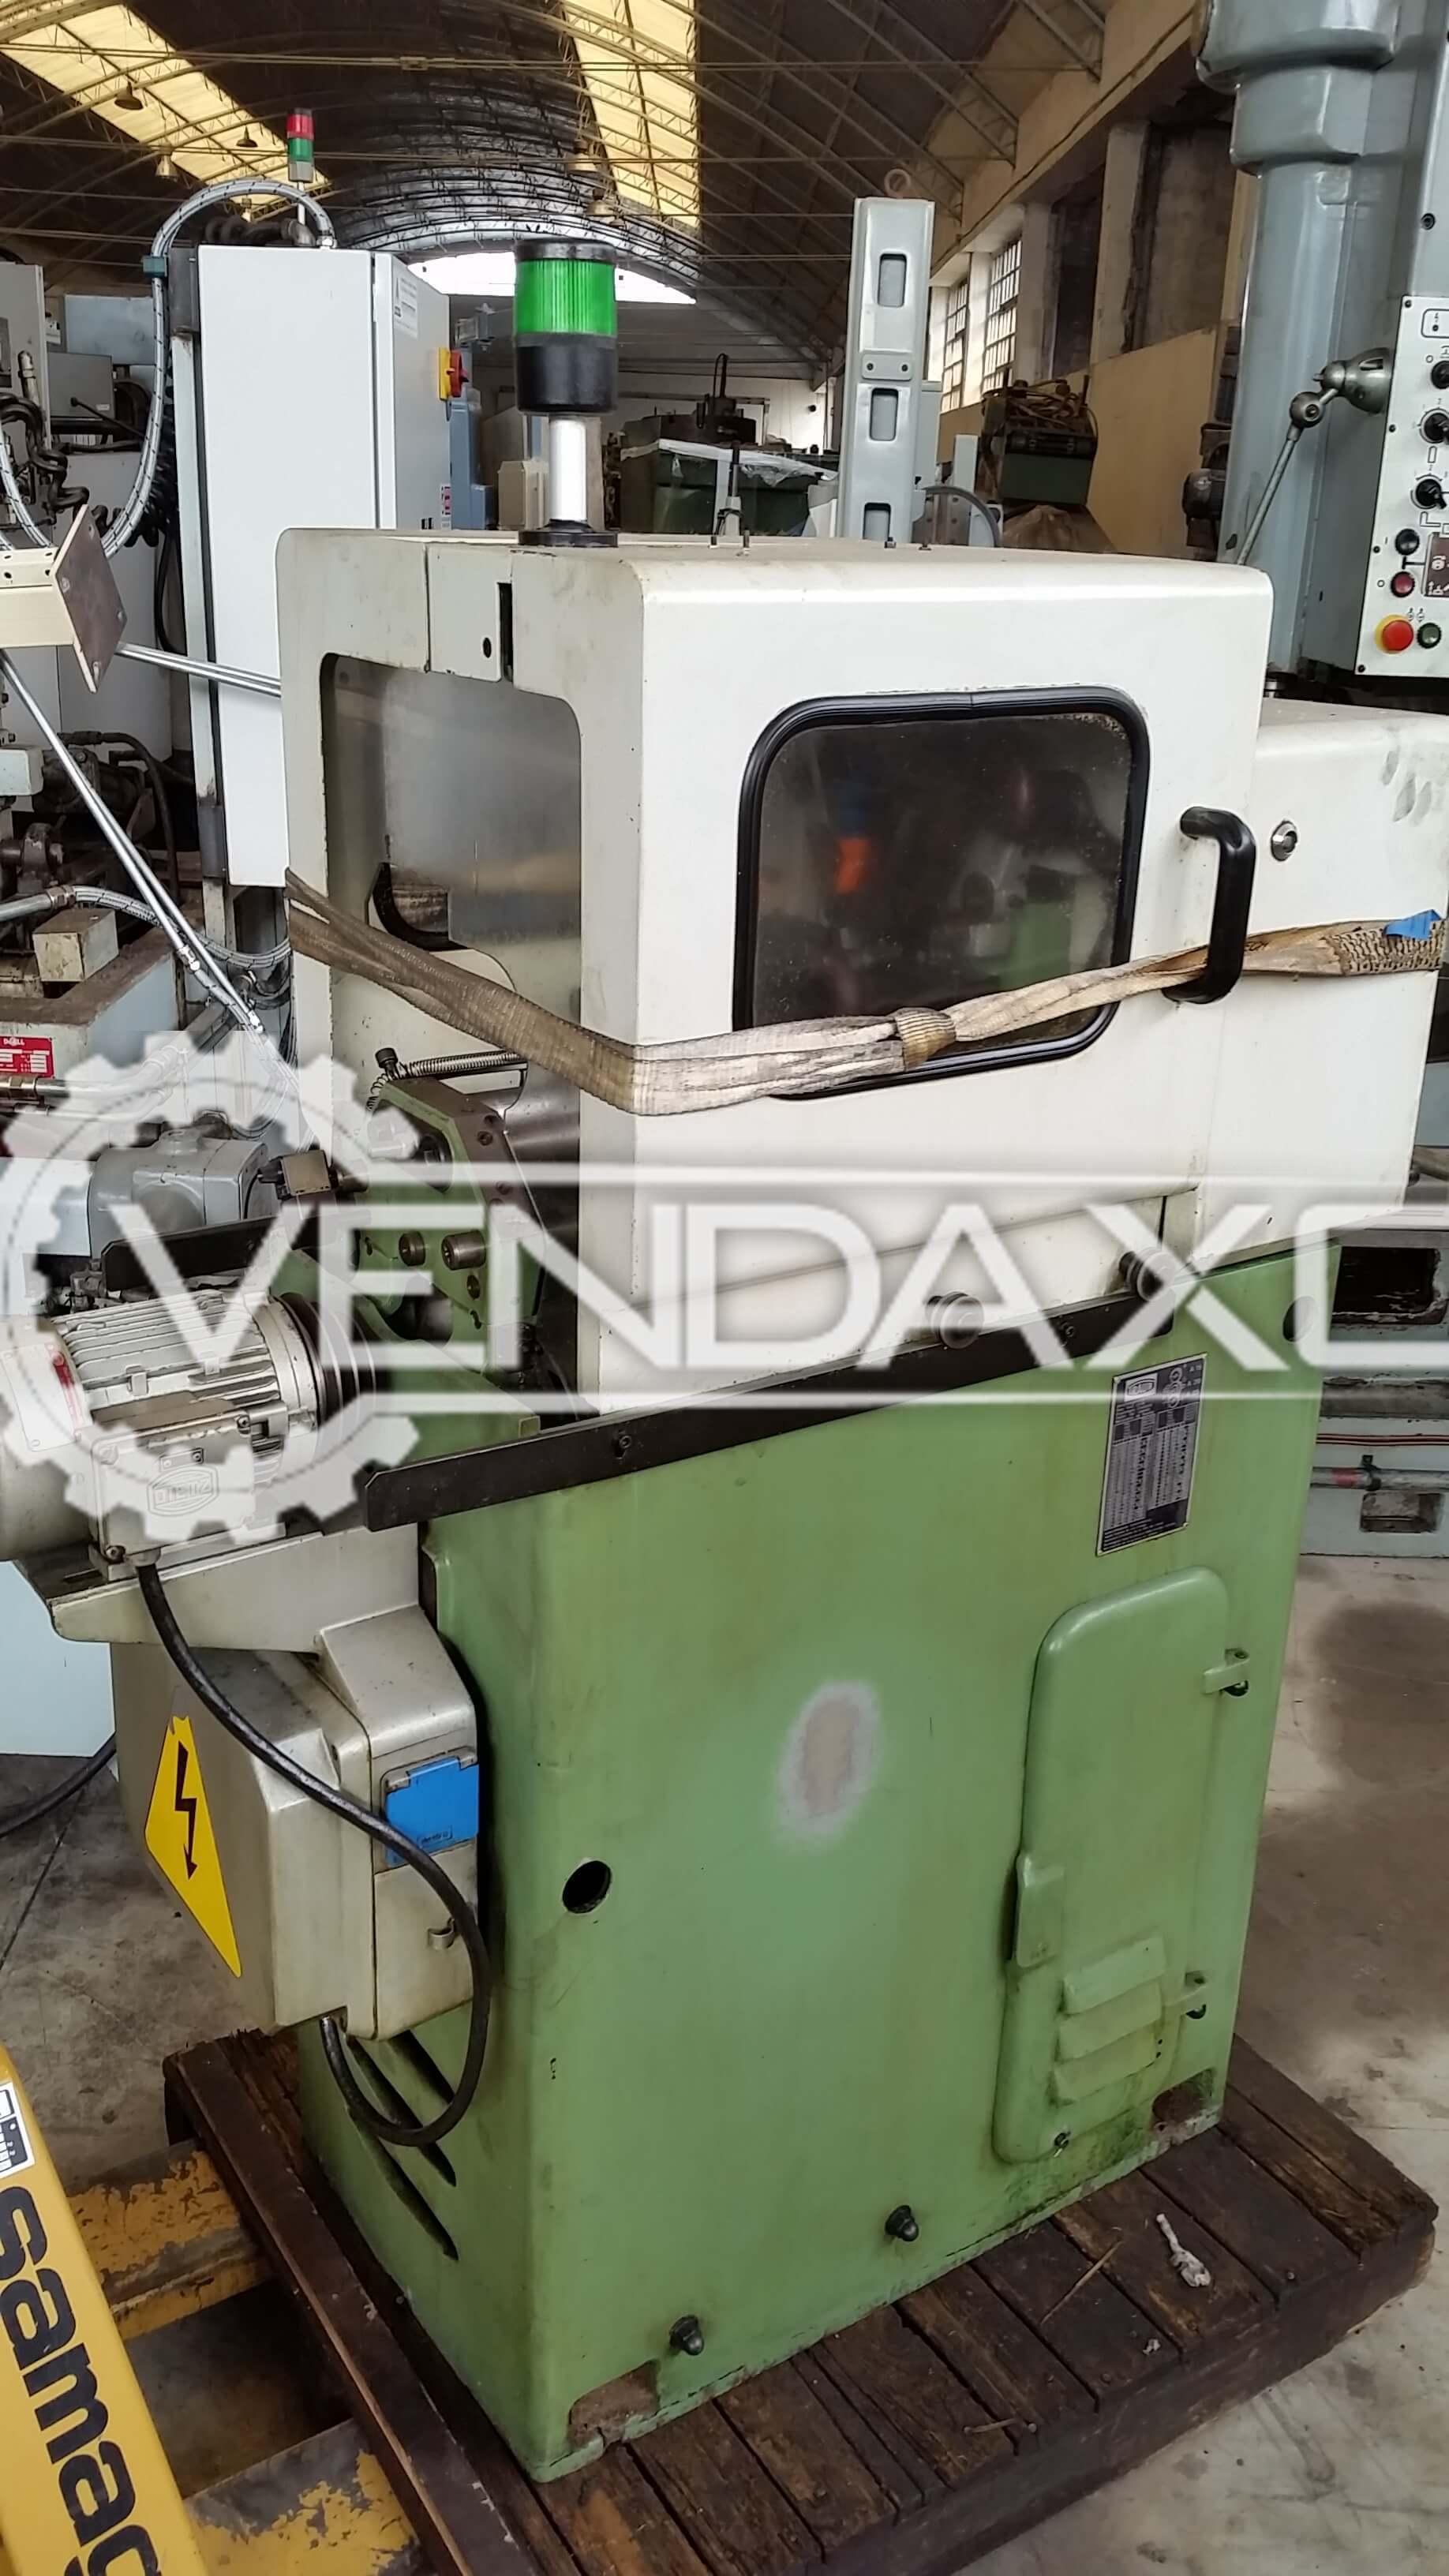 Traub A-25 CNC Lathe Machine